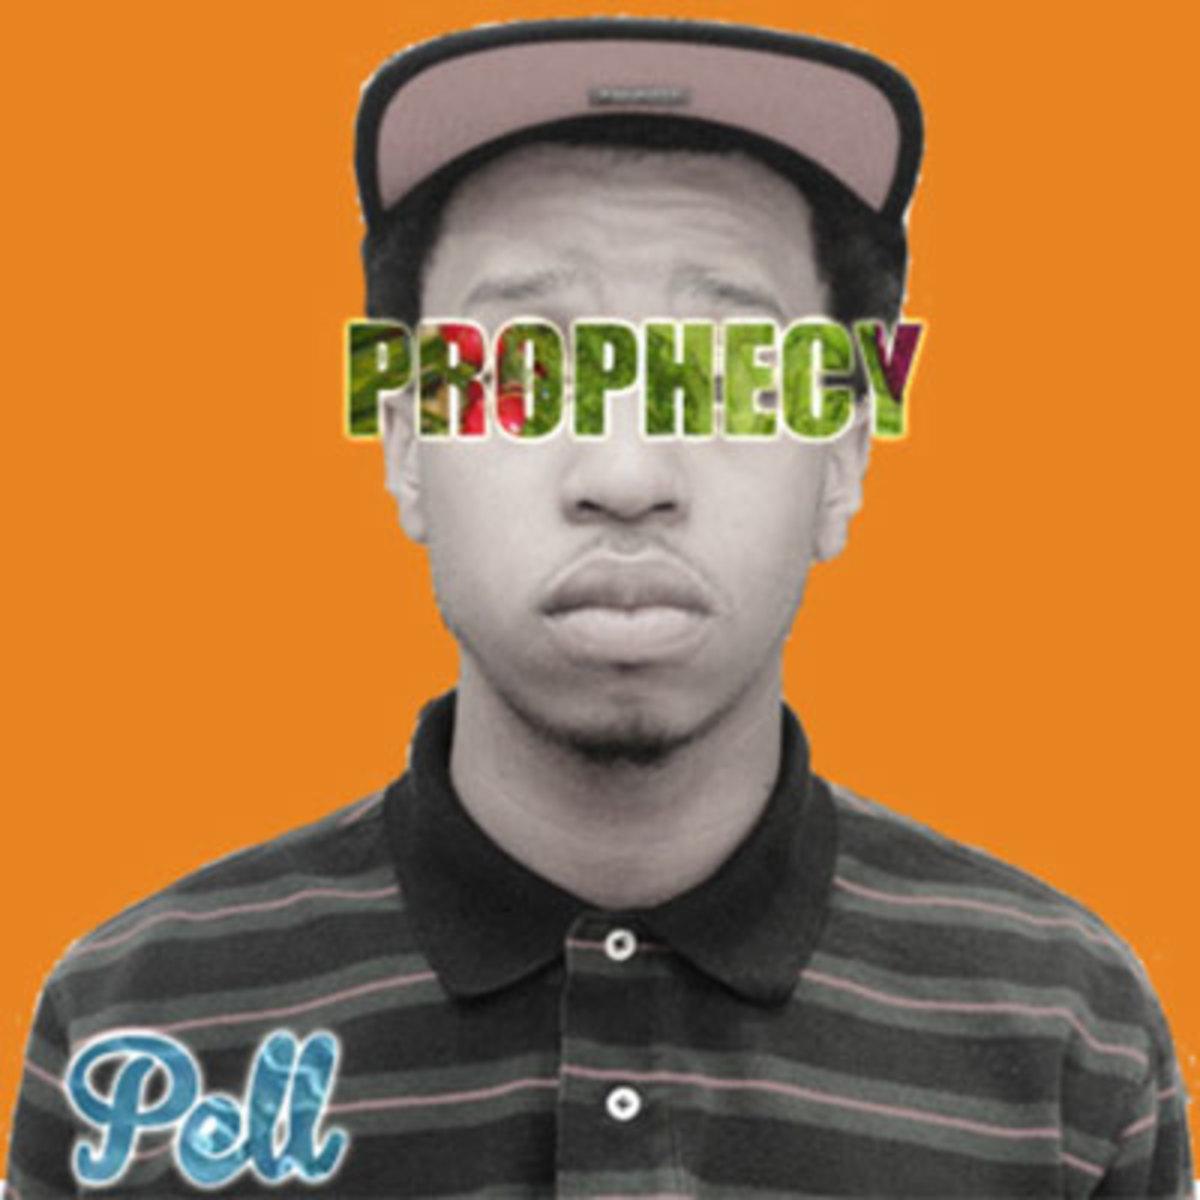 pell-prophecy.jpg